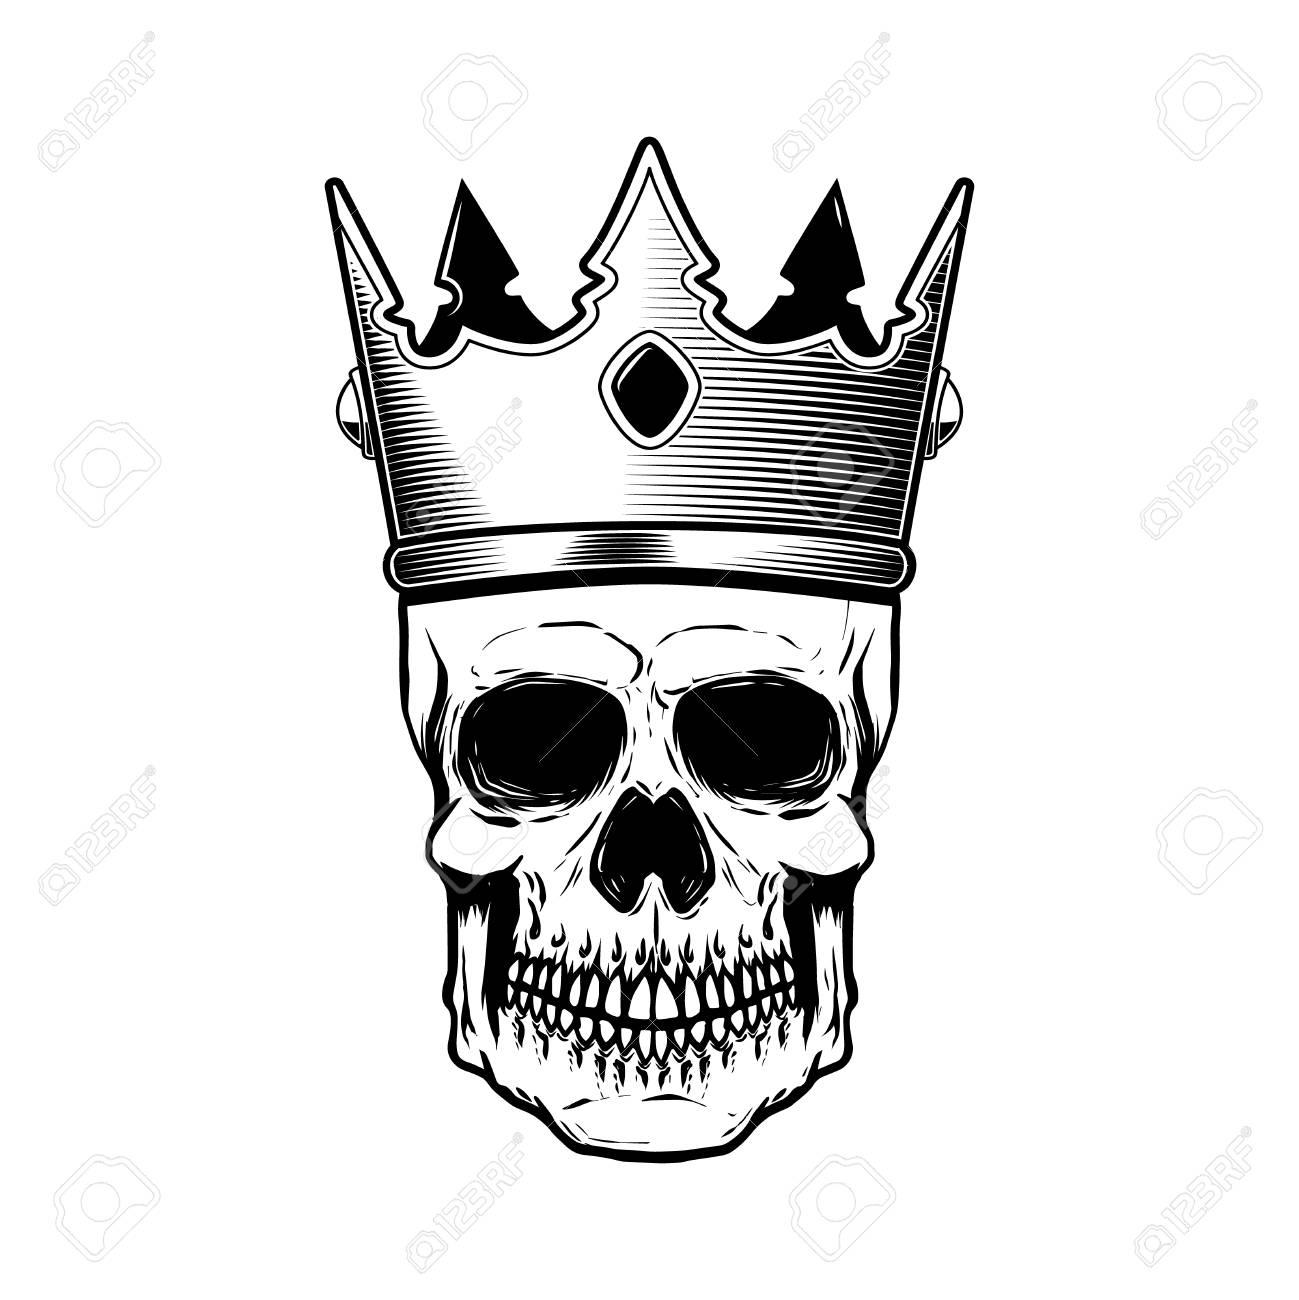 skull in king crown